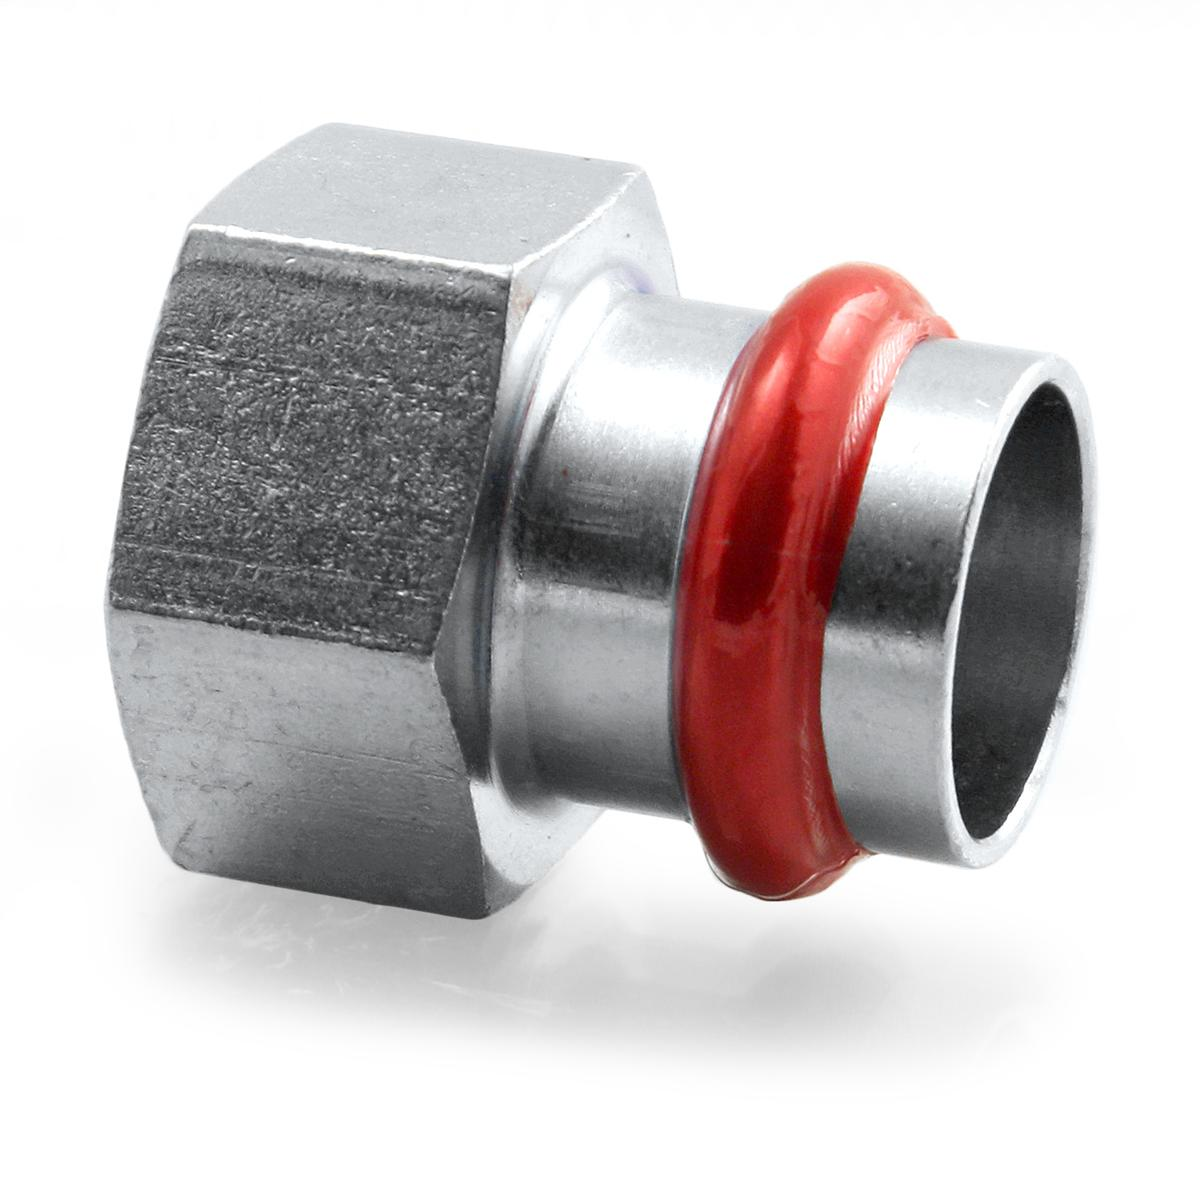 Press Steel Straight Female 4/4Fx22